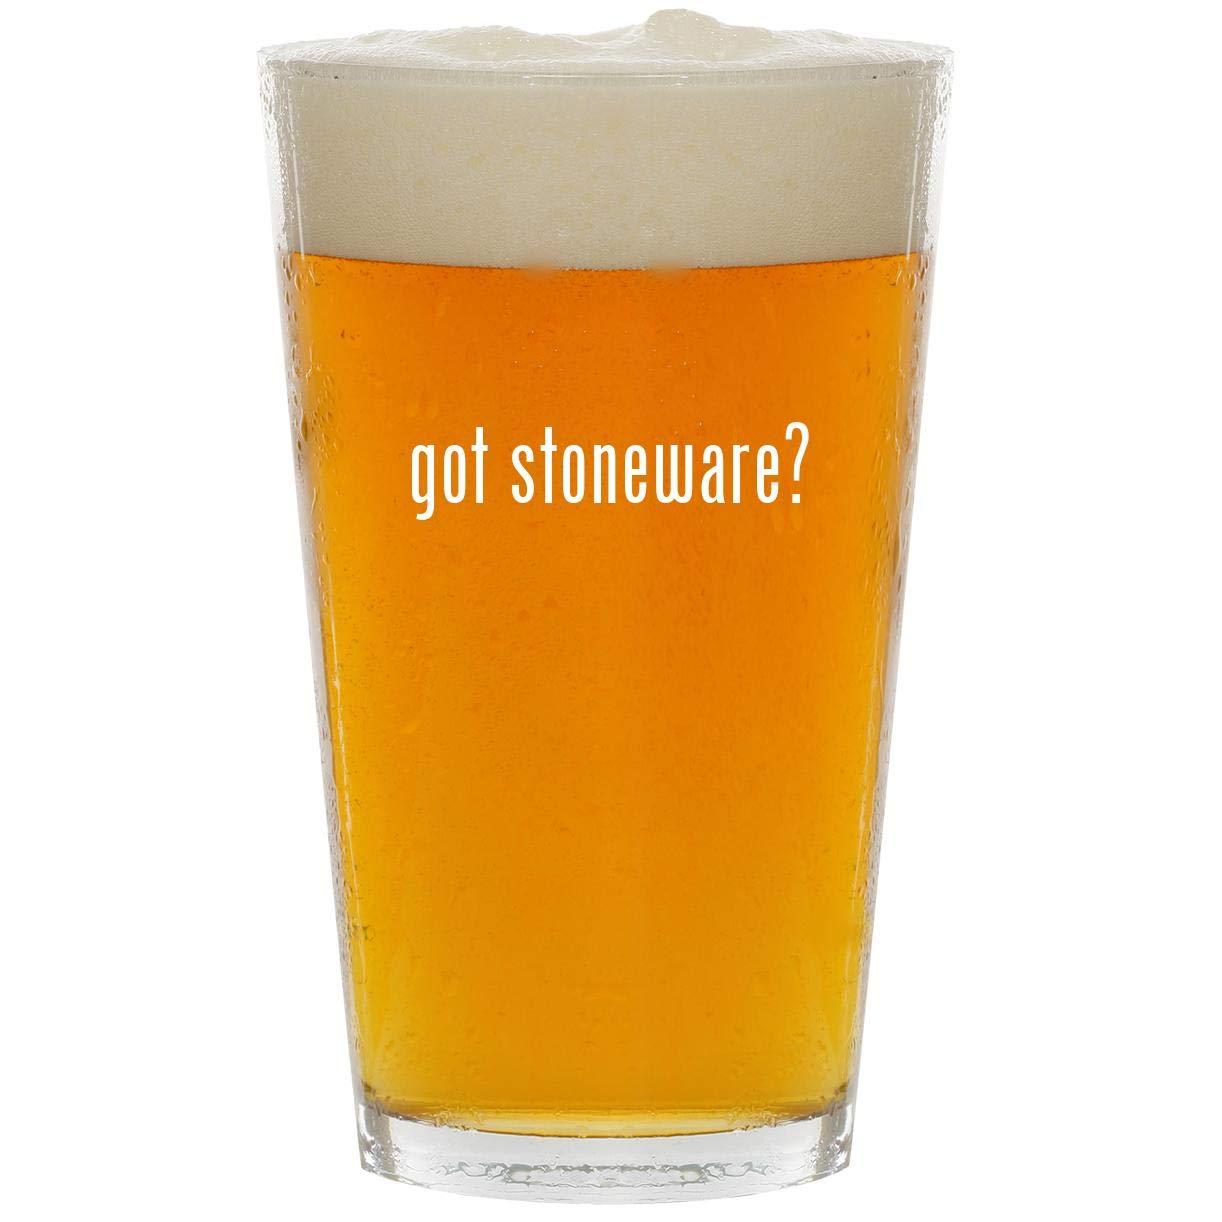 got stoneware? - Glass 16oz Beer Pint